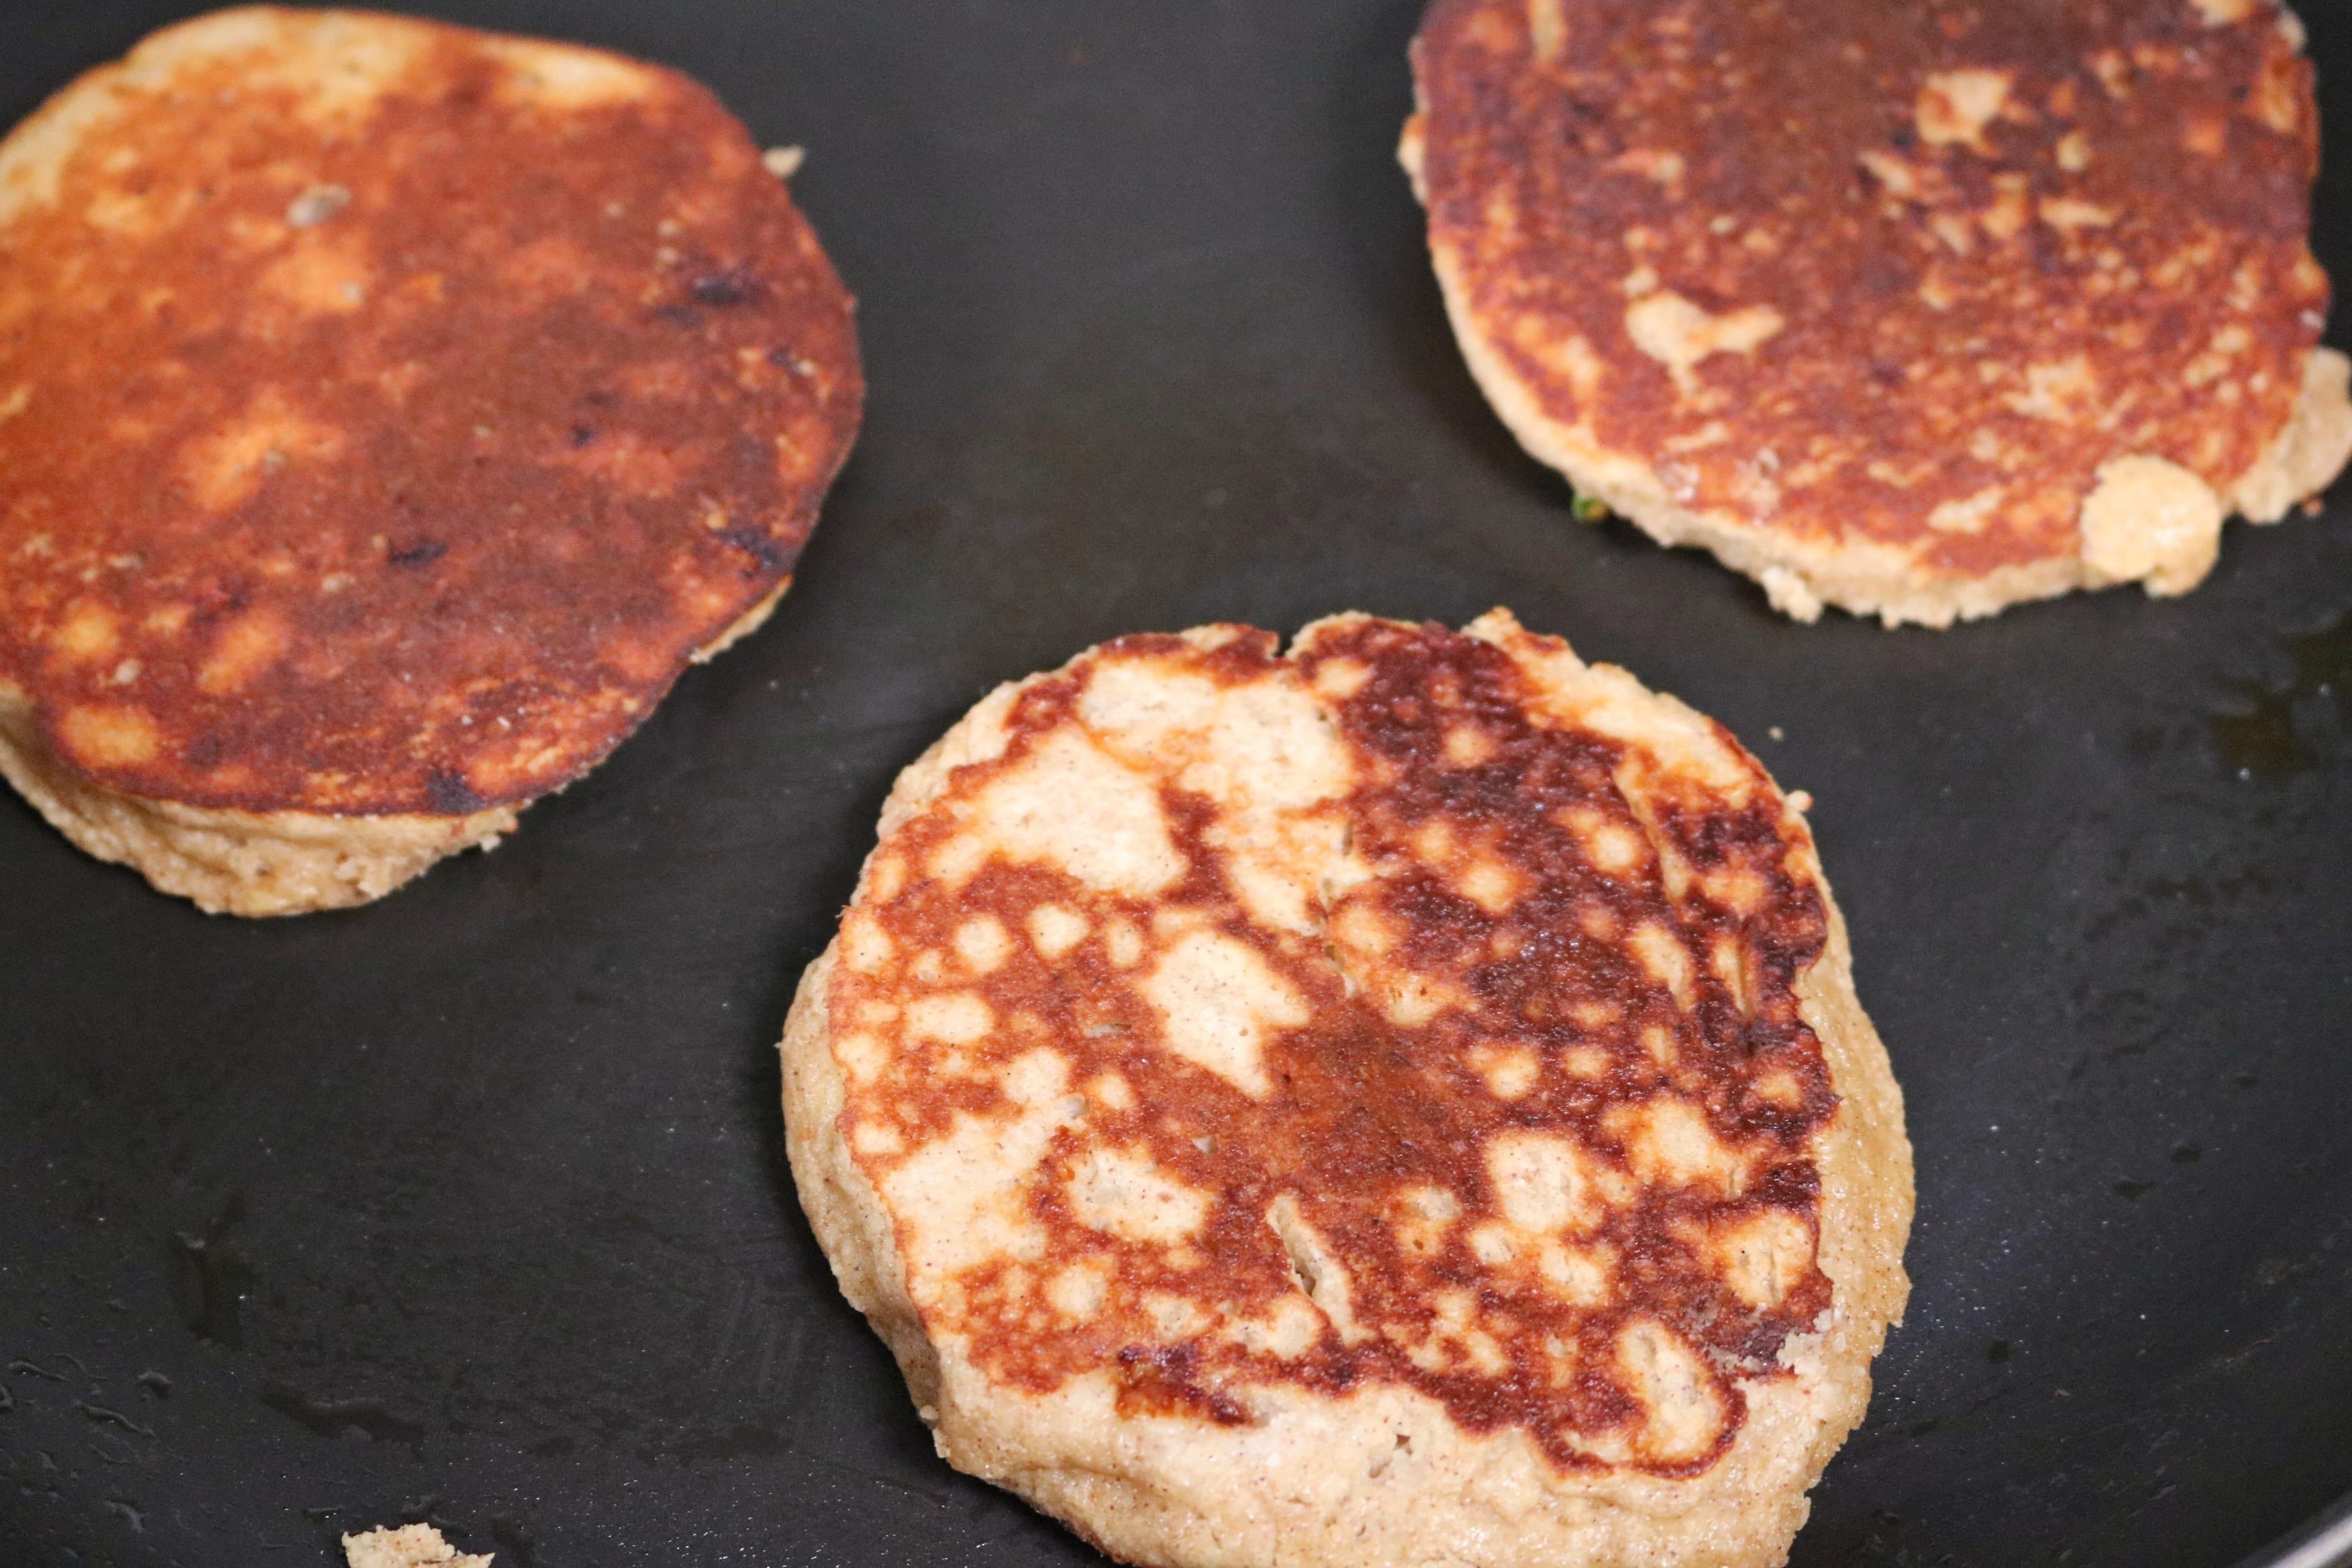 Gluten free peanut butter banana pancakes